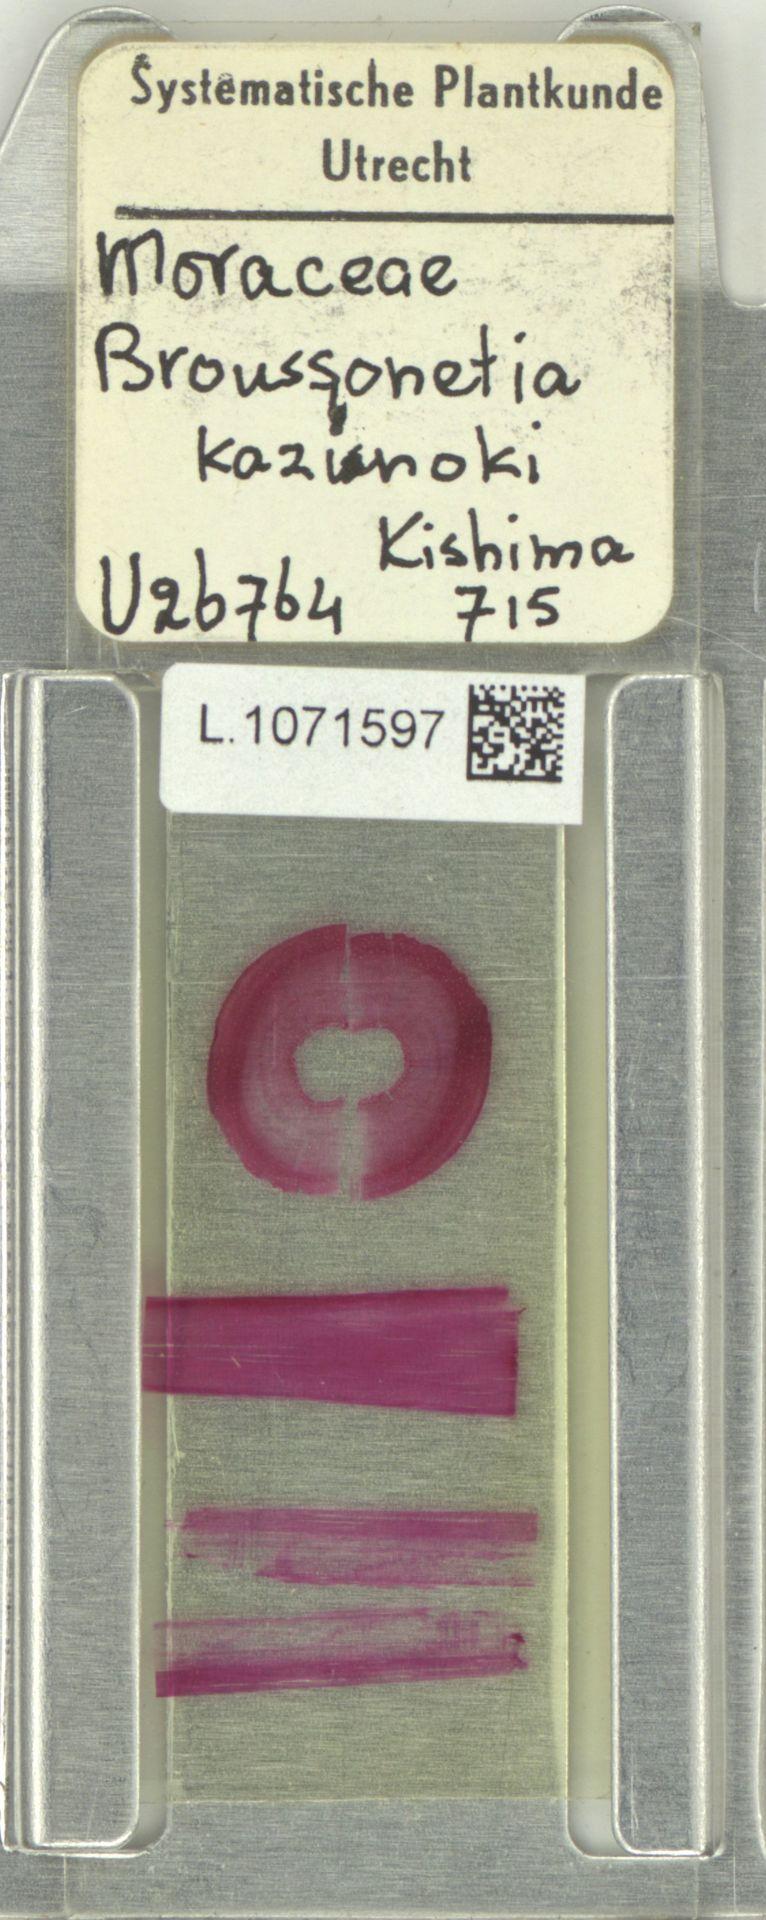 L.1071597 | Broussonetia kazinoki Siebold